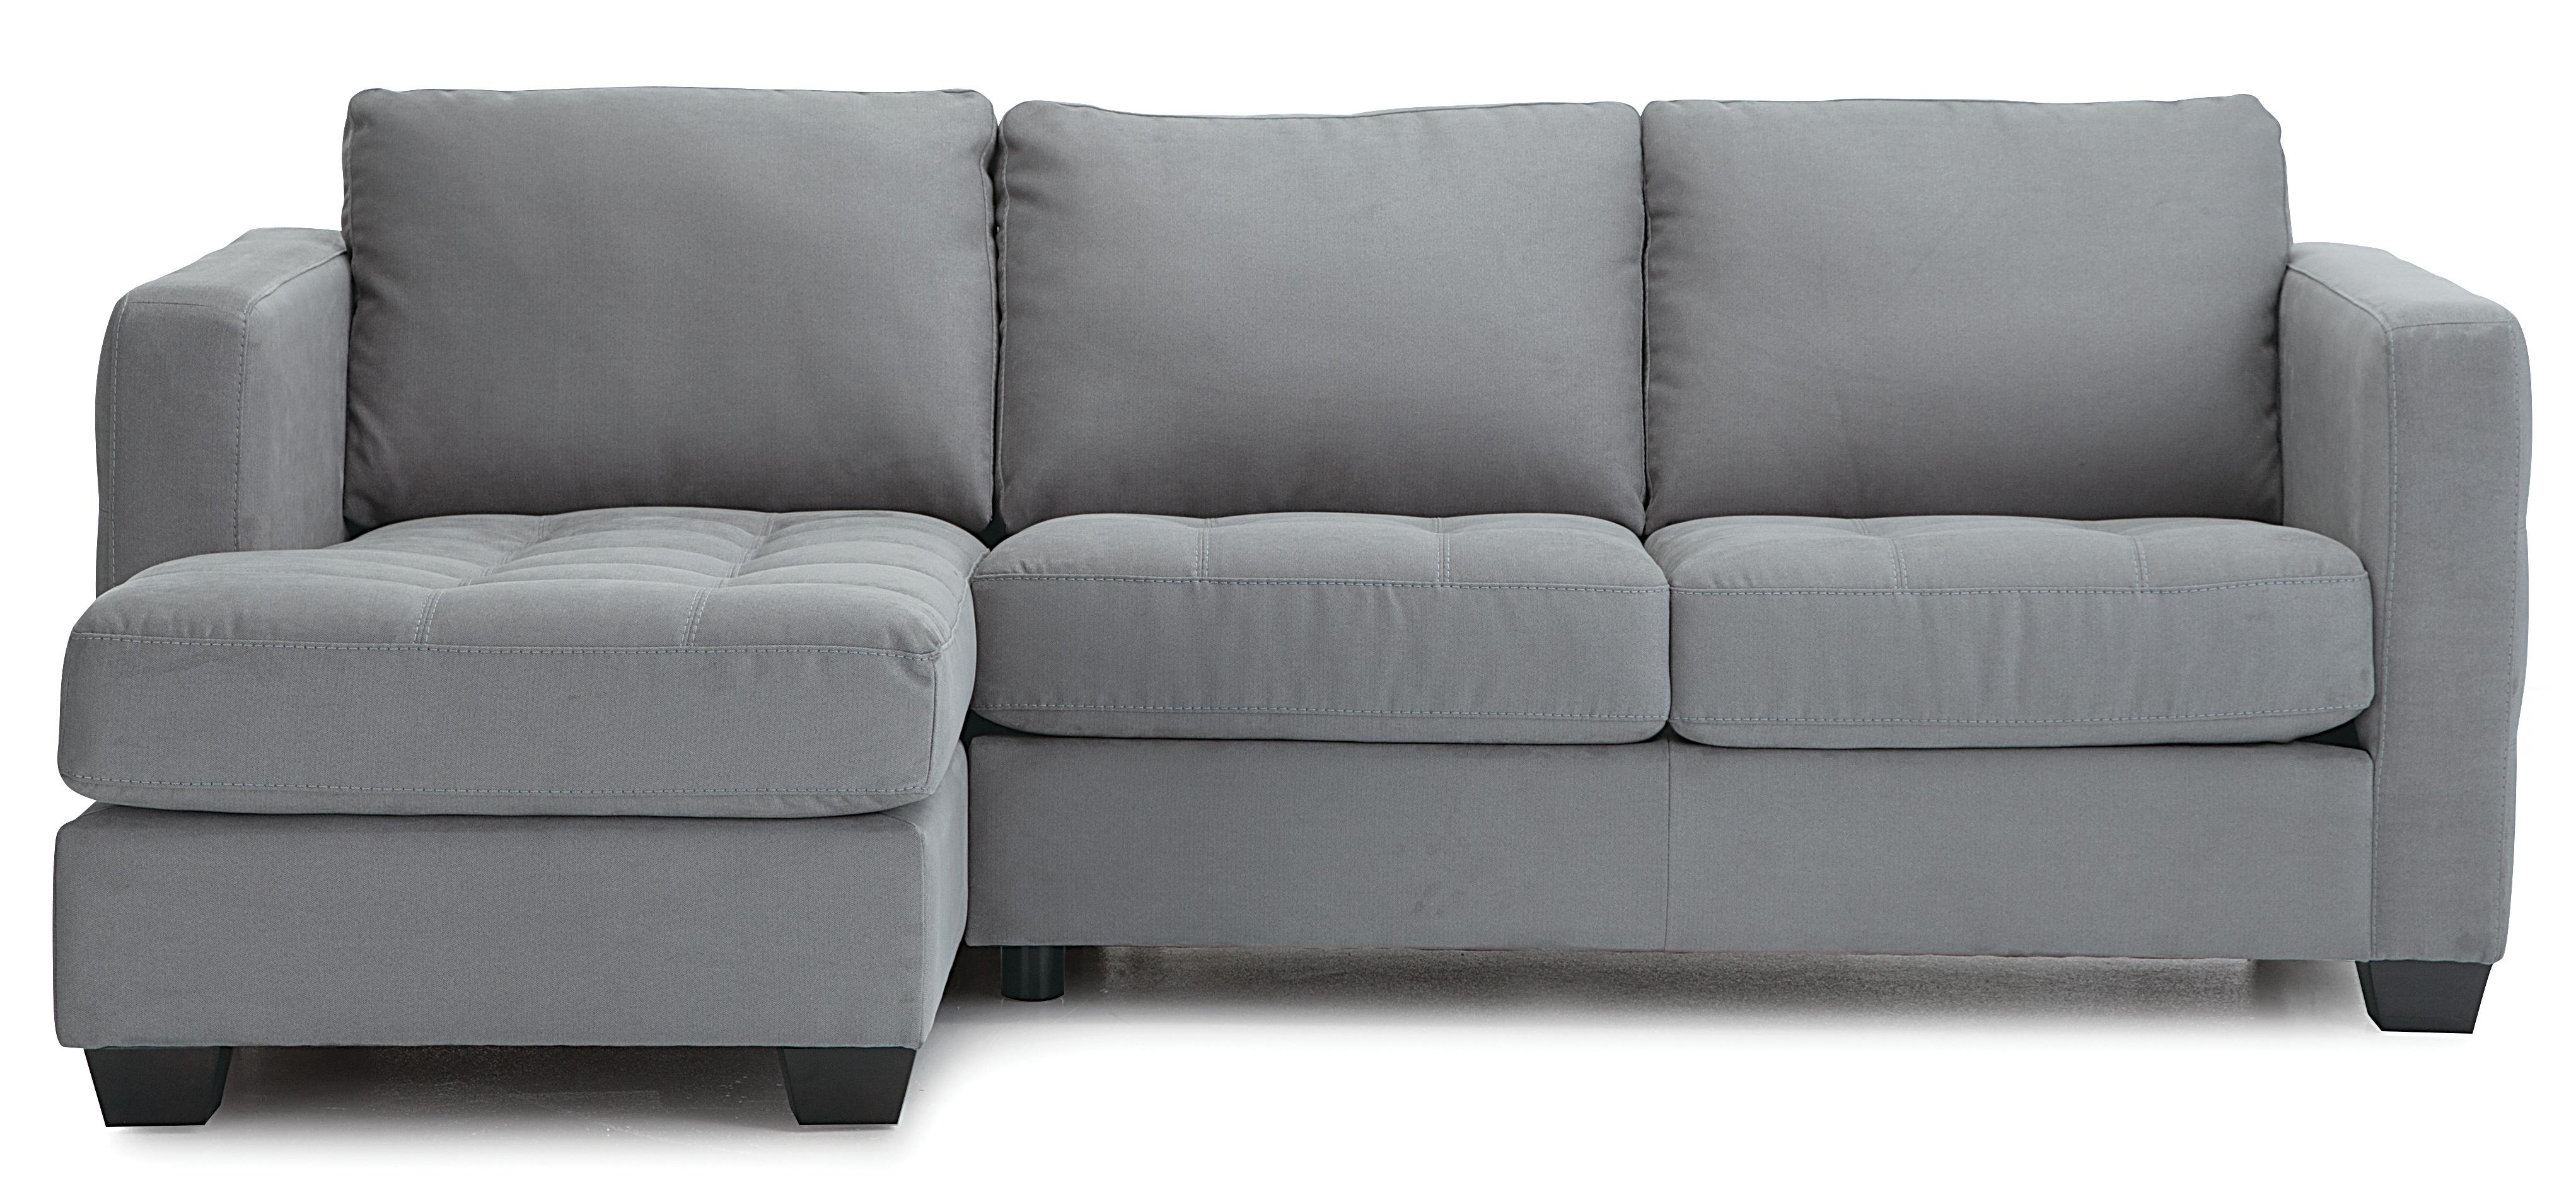 Stupendous Barrett 77558 70558 Sectional 350 Fabrics Sofas And Ibusinesslaw Wood Chair Design Ideas Ibusinesslaworg